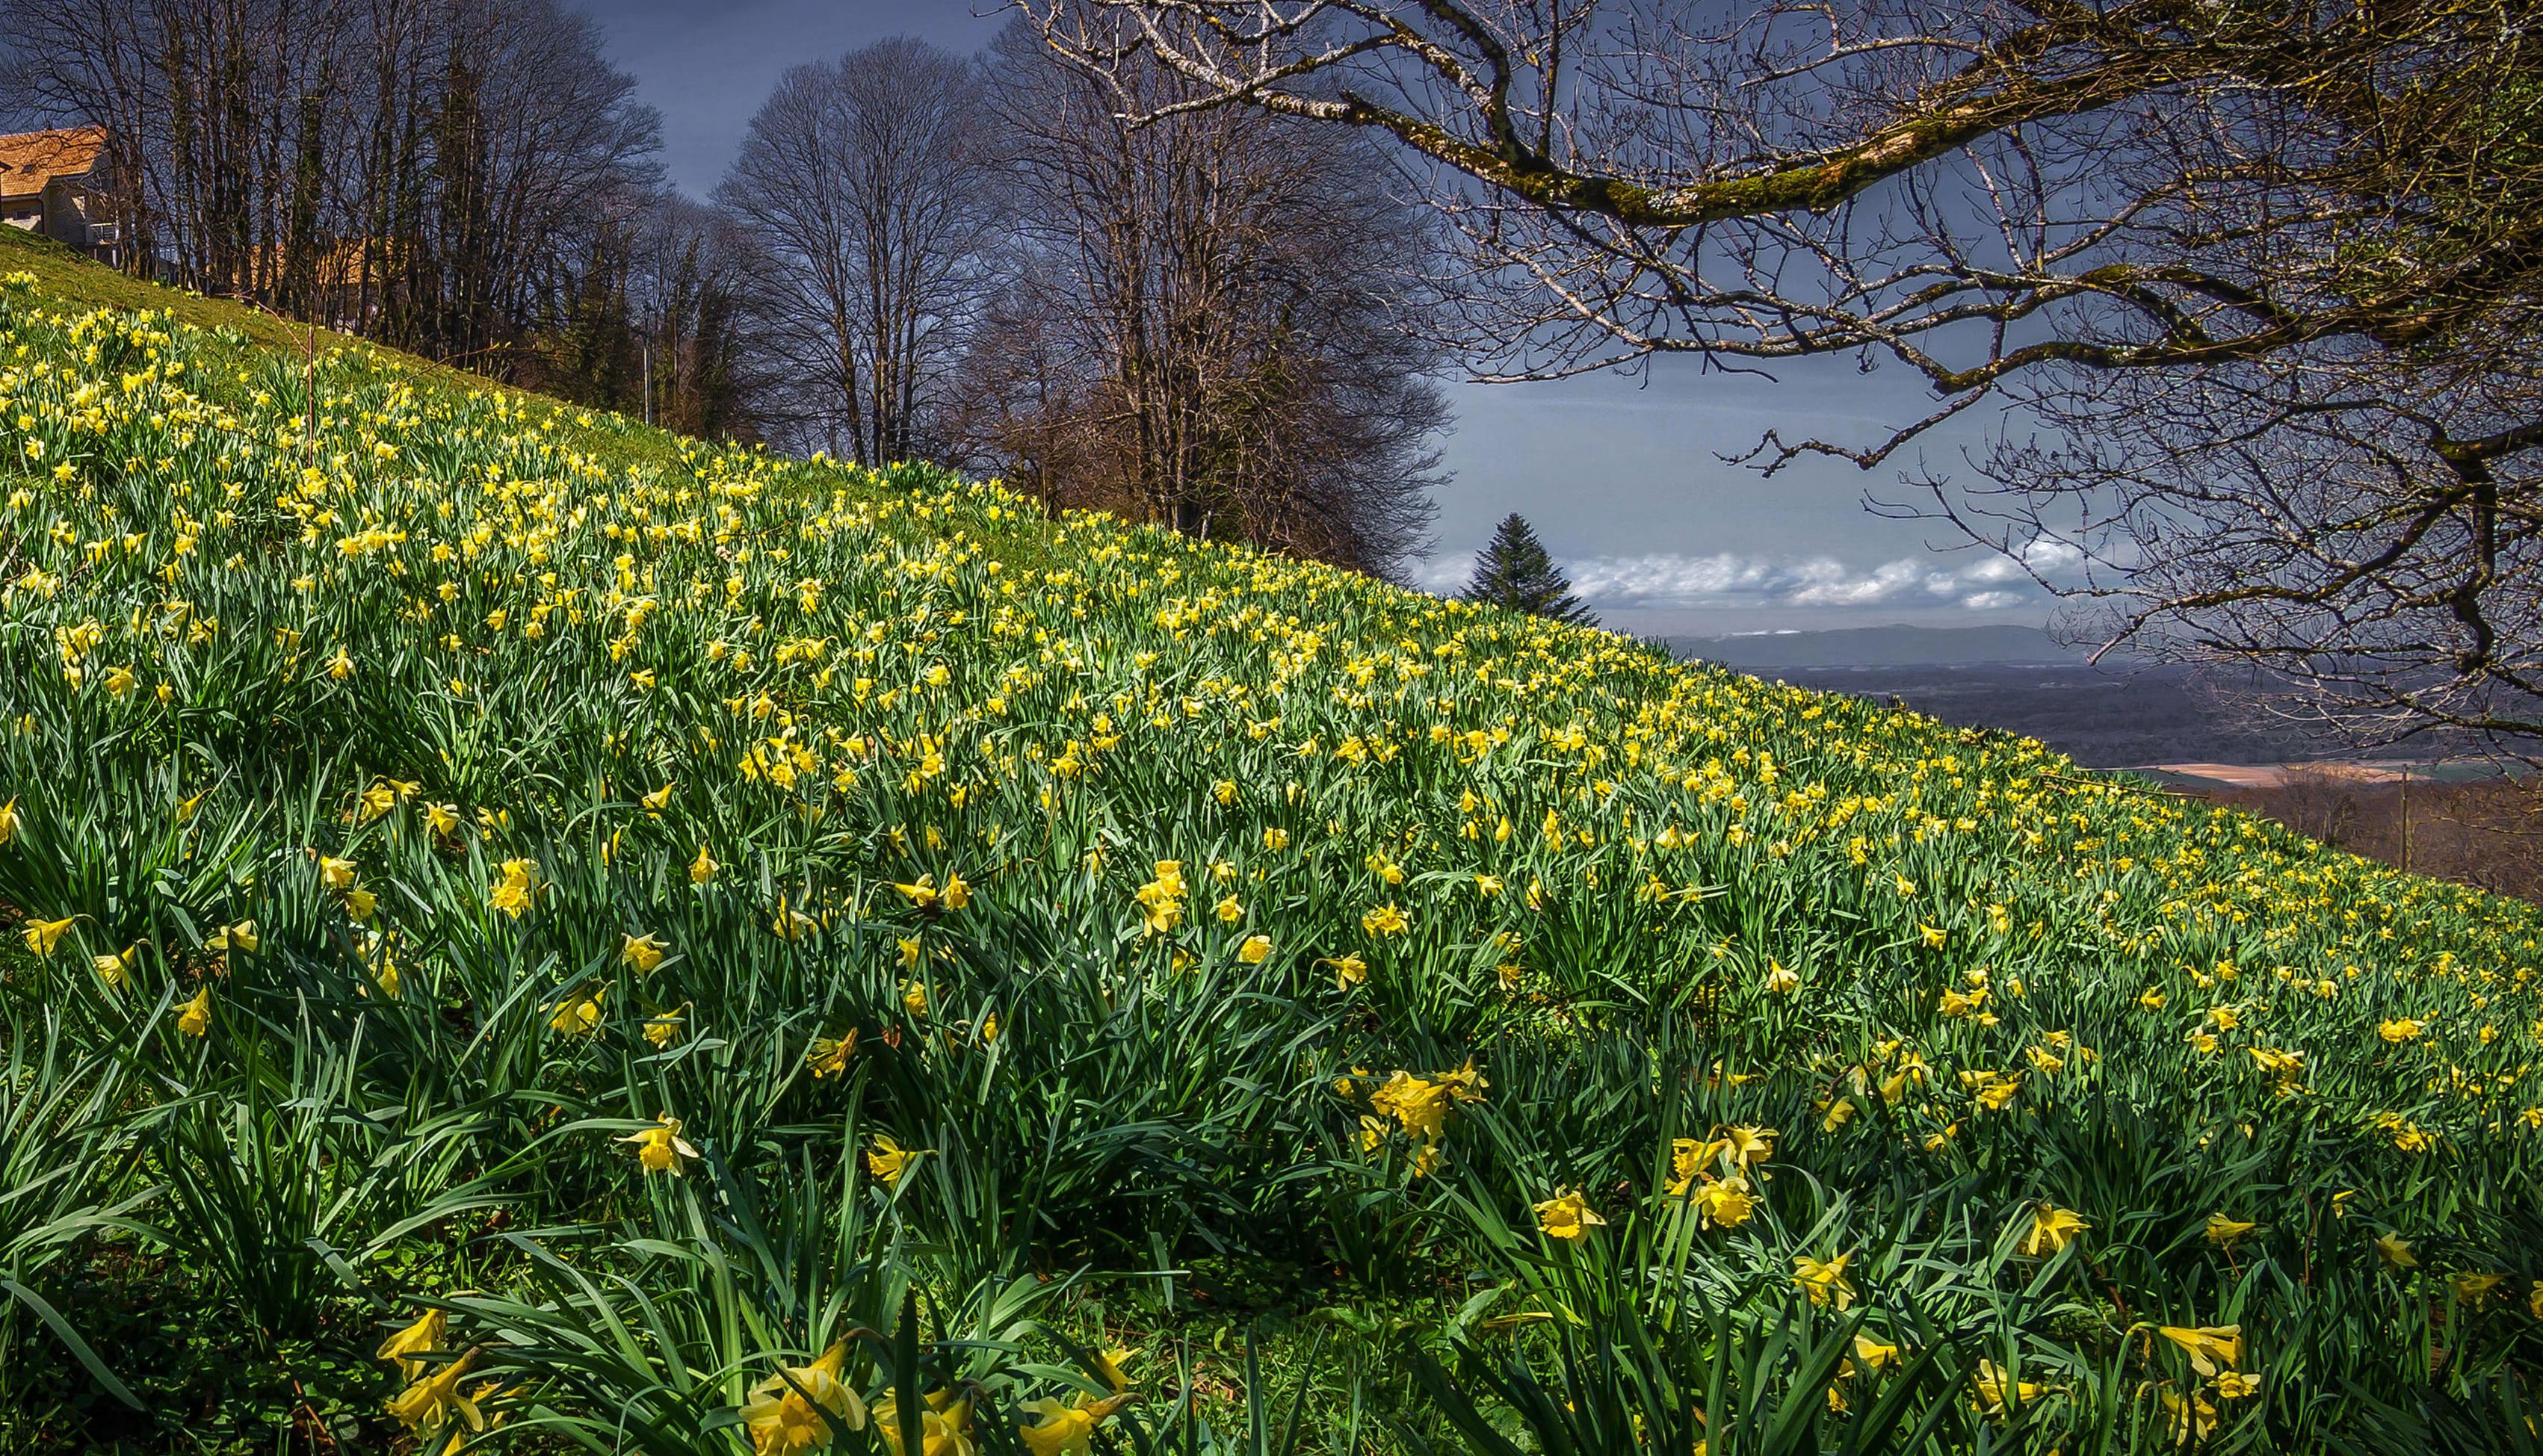 daffodils-photo-12